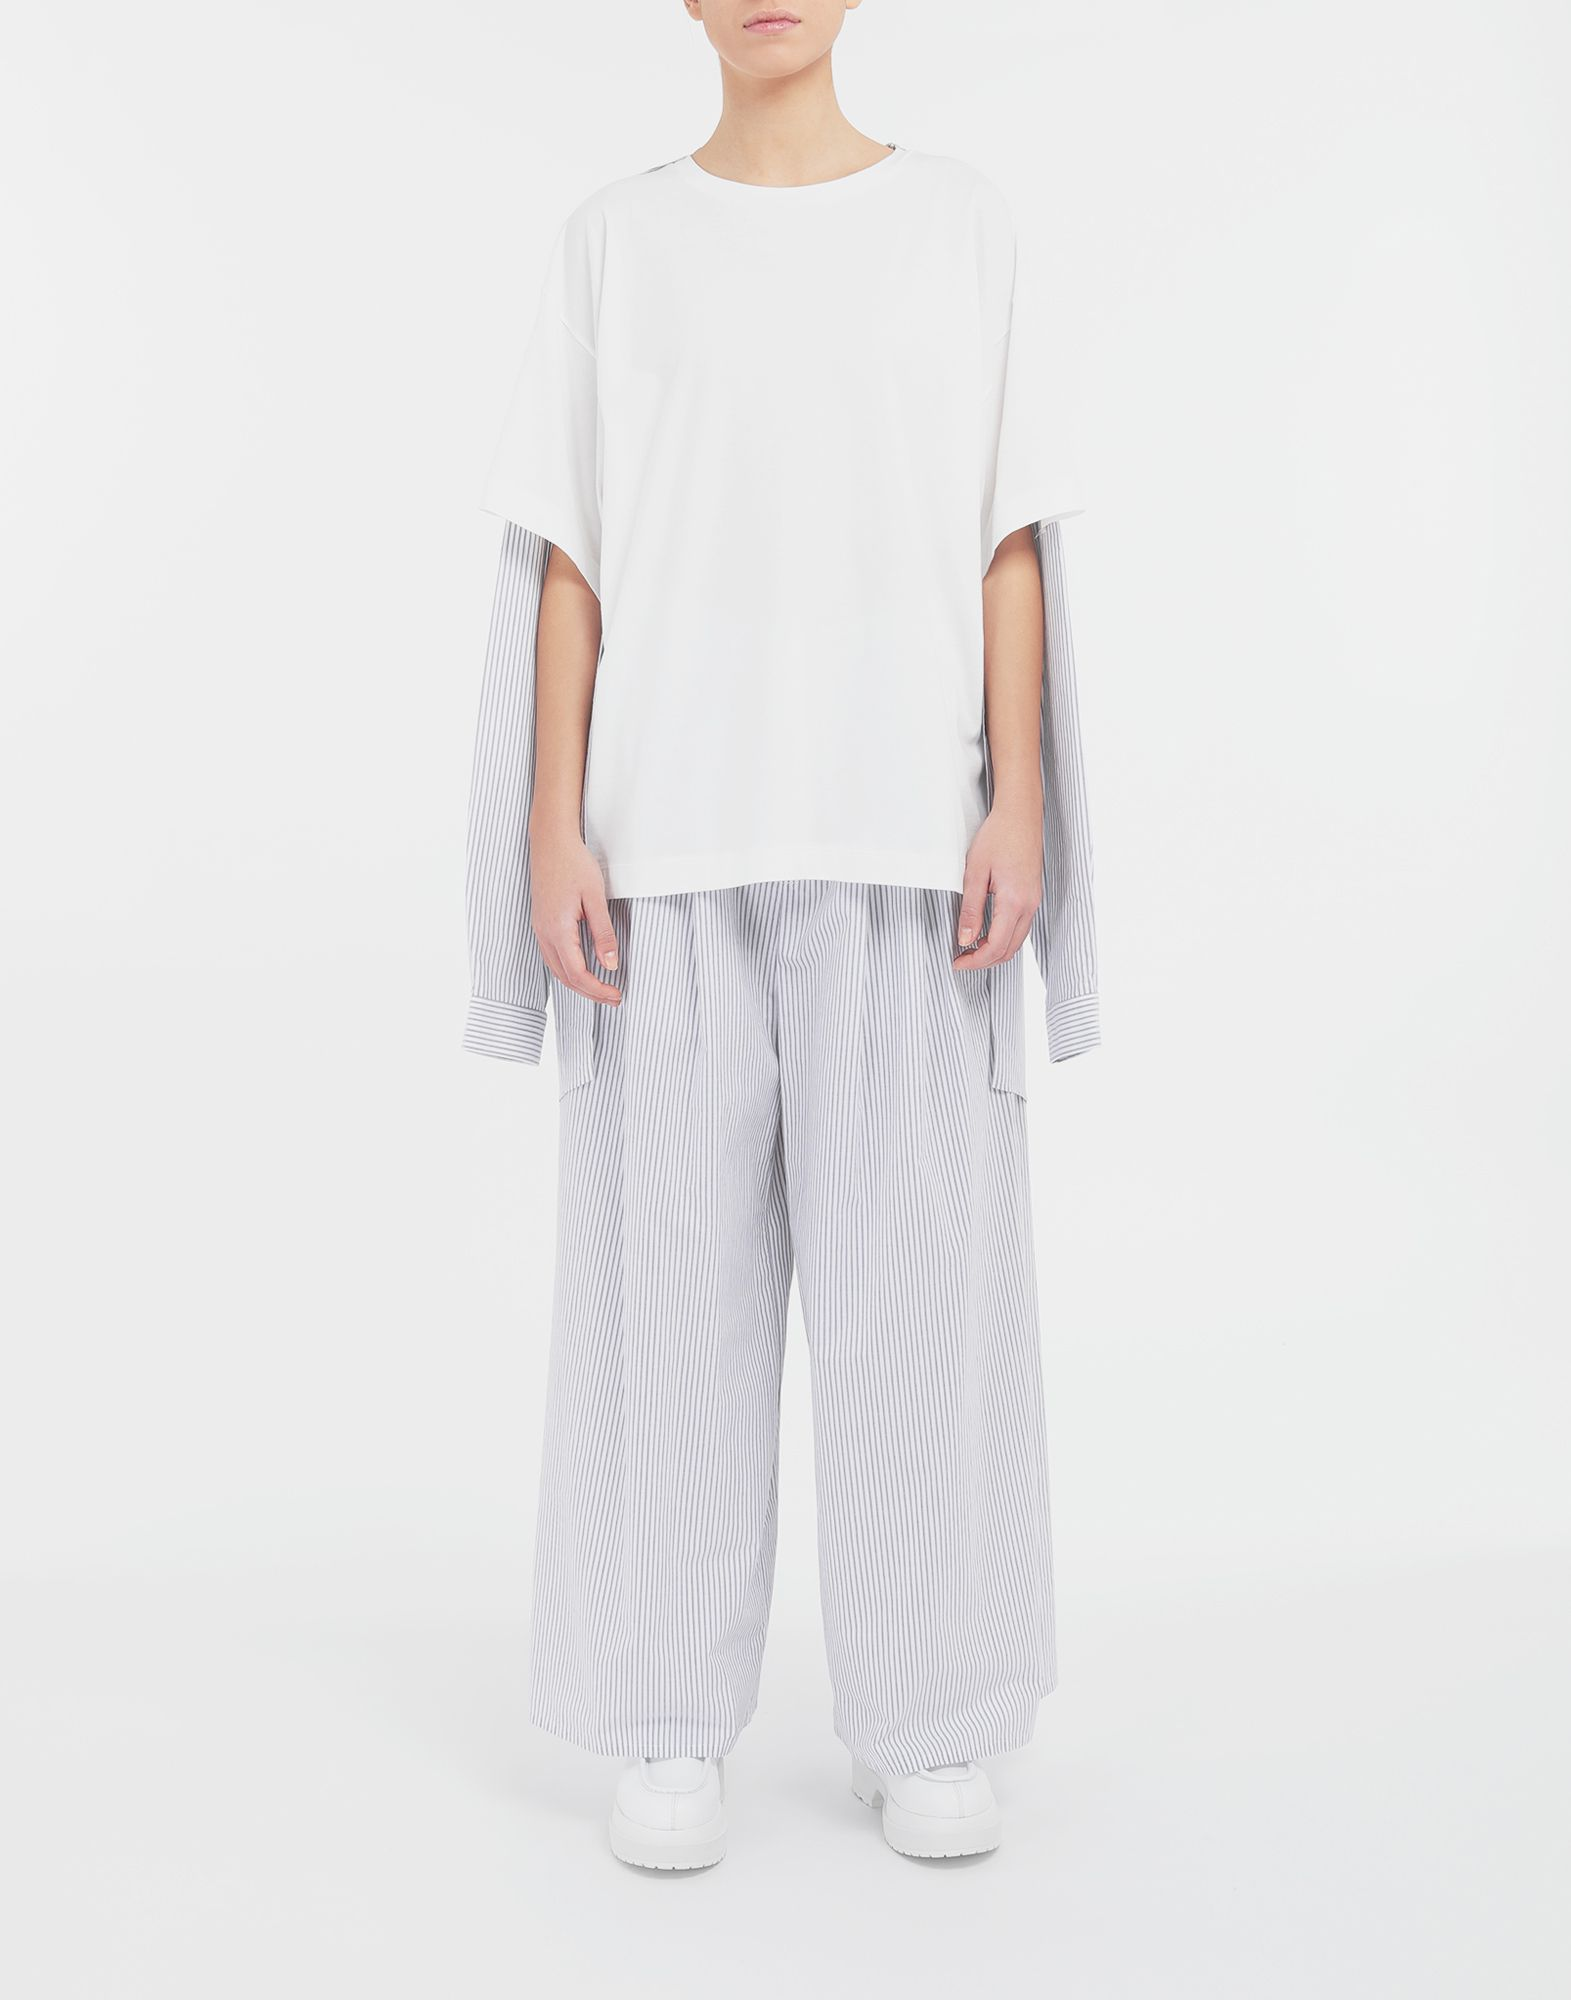 MM6 MAISON MARGIELA Flared striped cotton pants Trousers Woman d